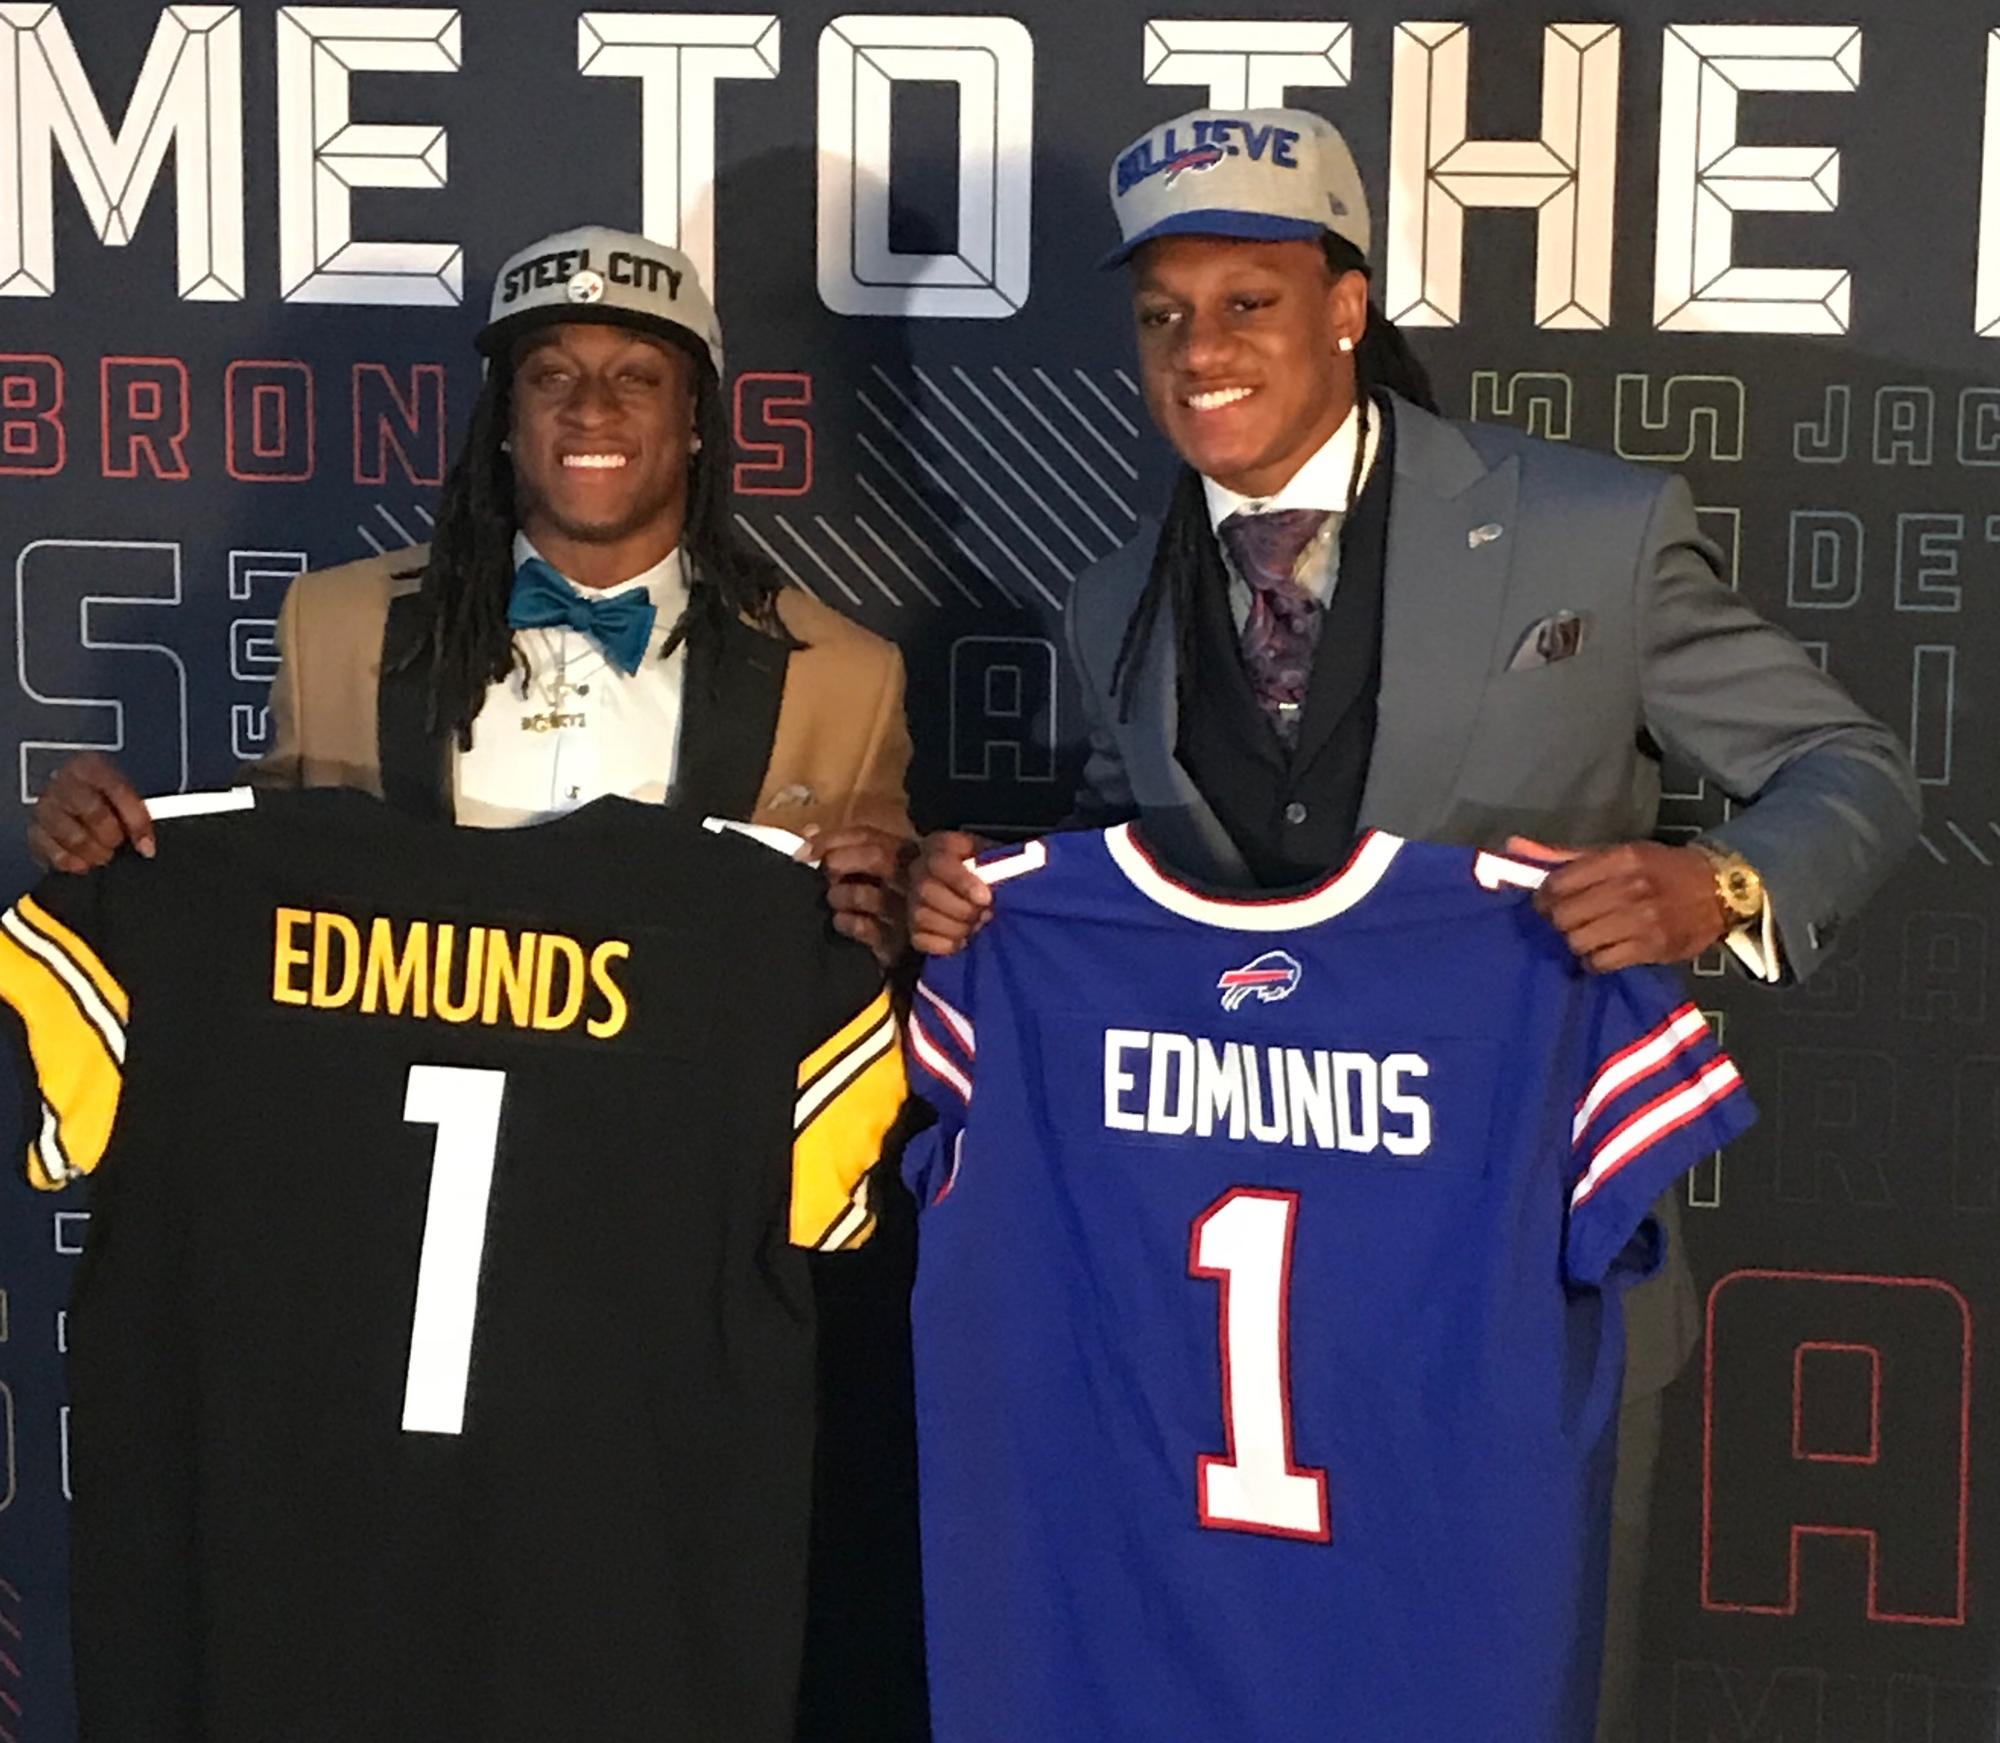 Edmunds_bros_18FB_NFLdraft_jerseys_H.jpeg